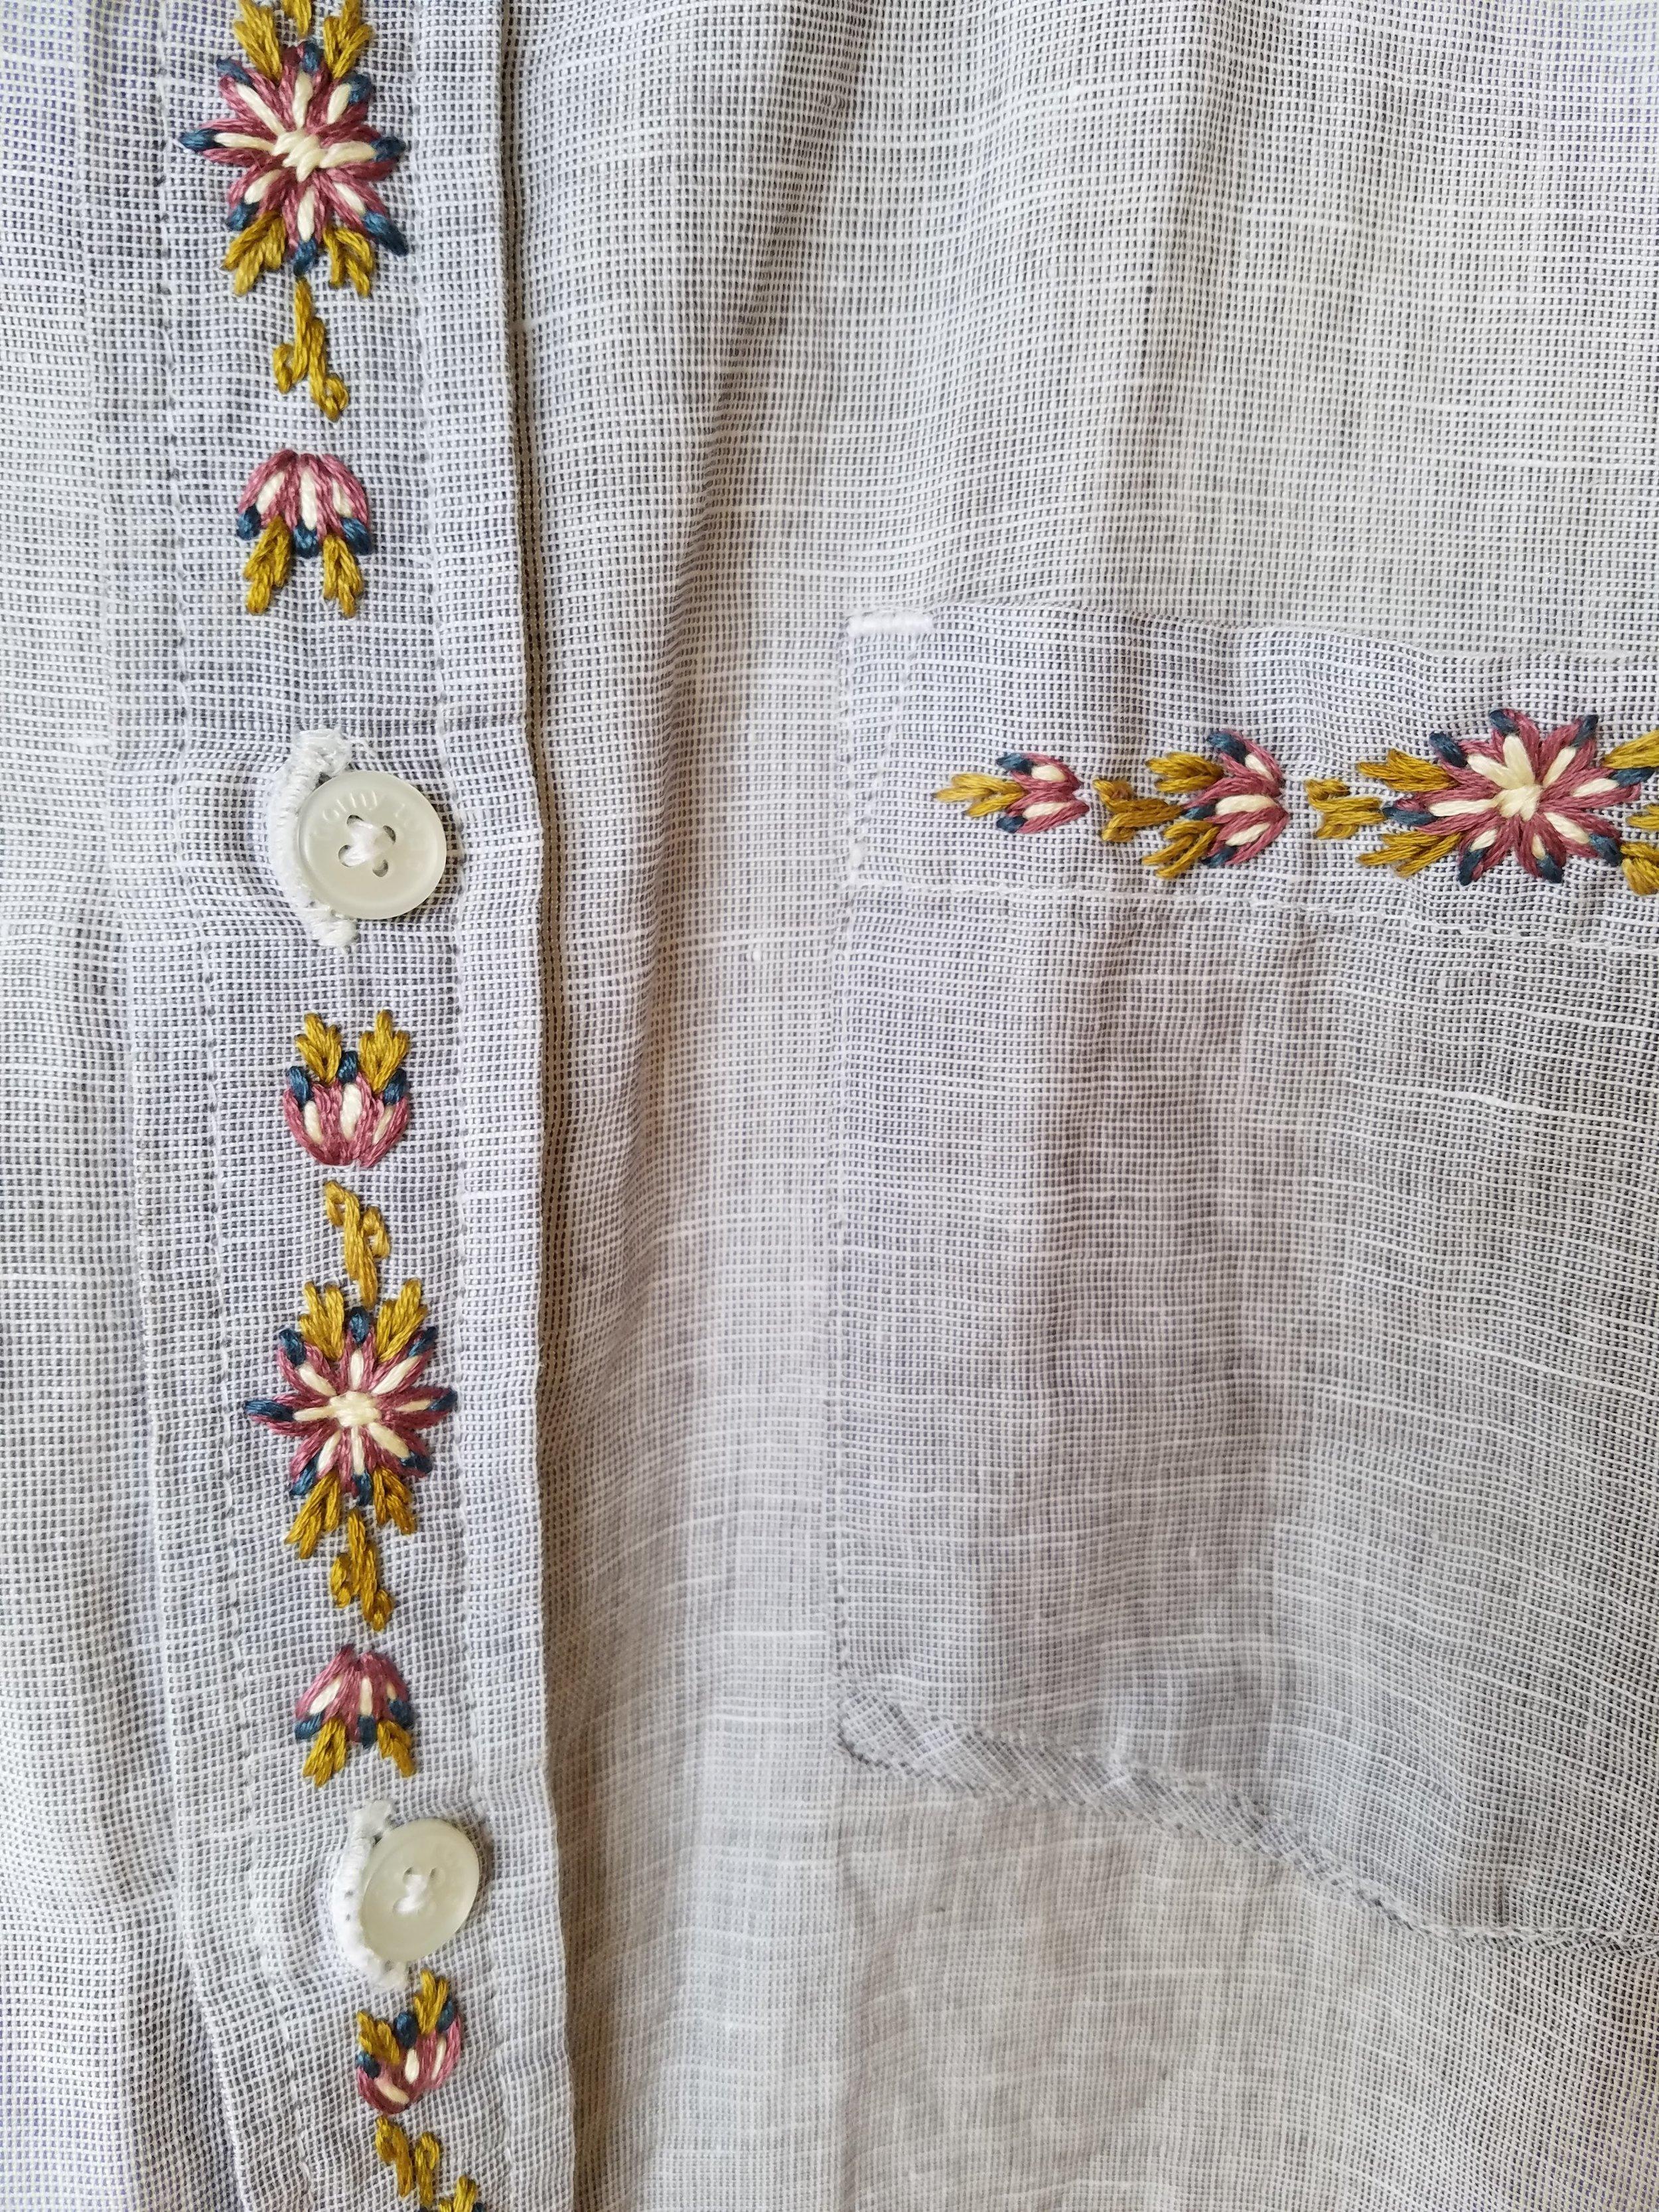 First men's linen shirt with embroidery by Dah John